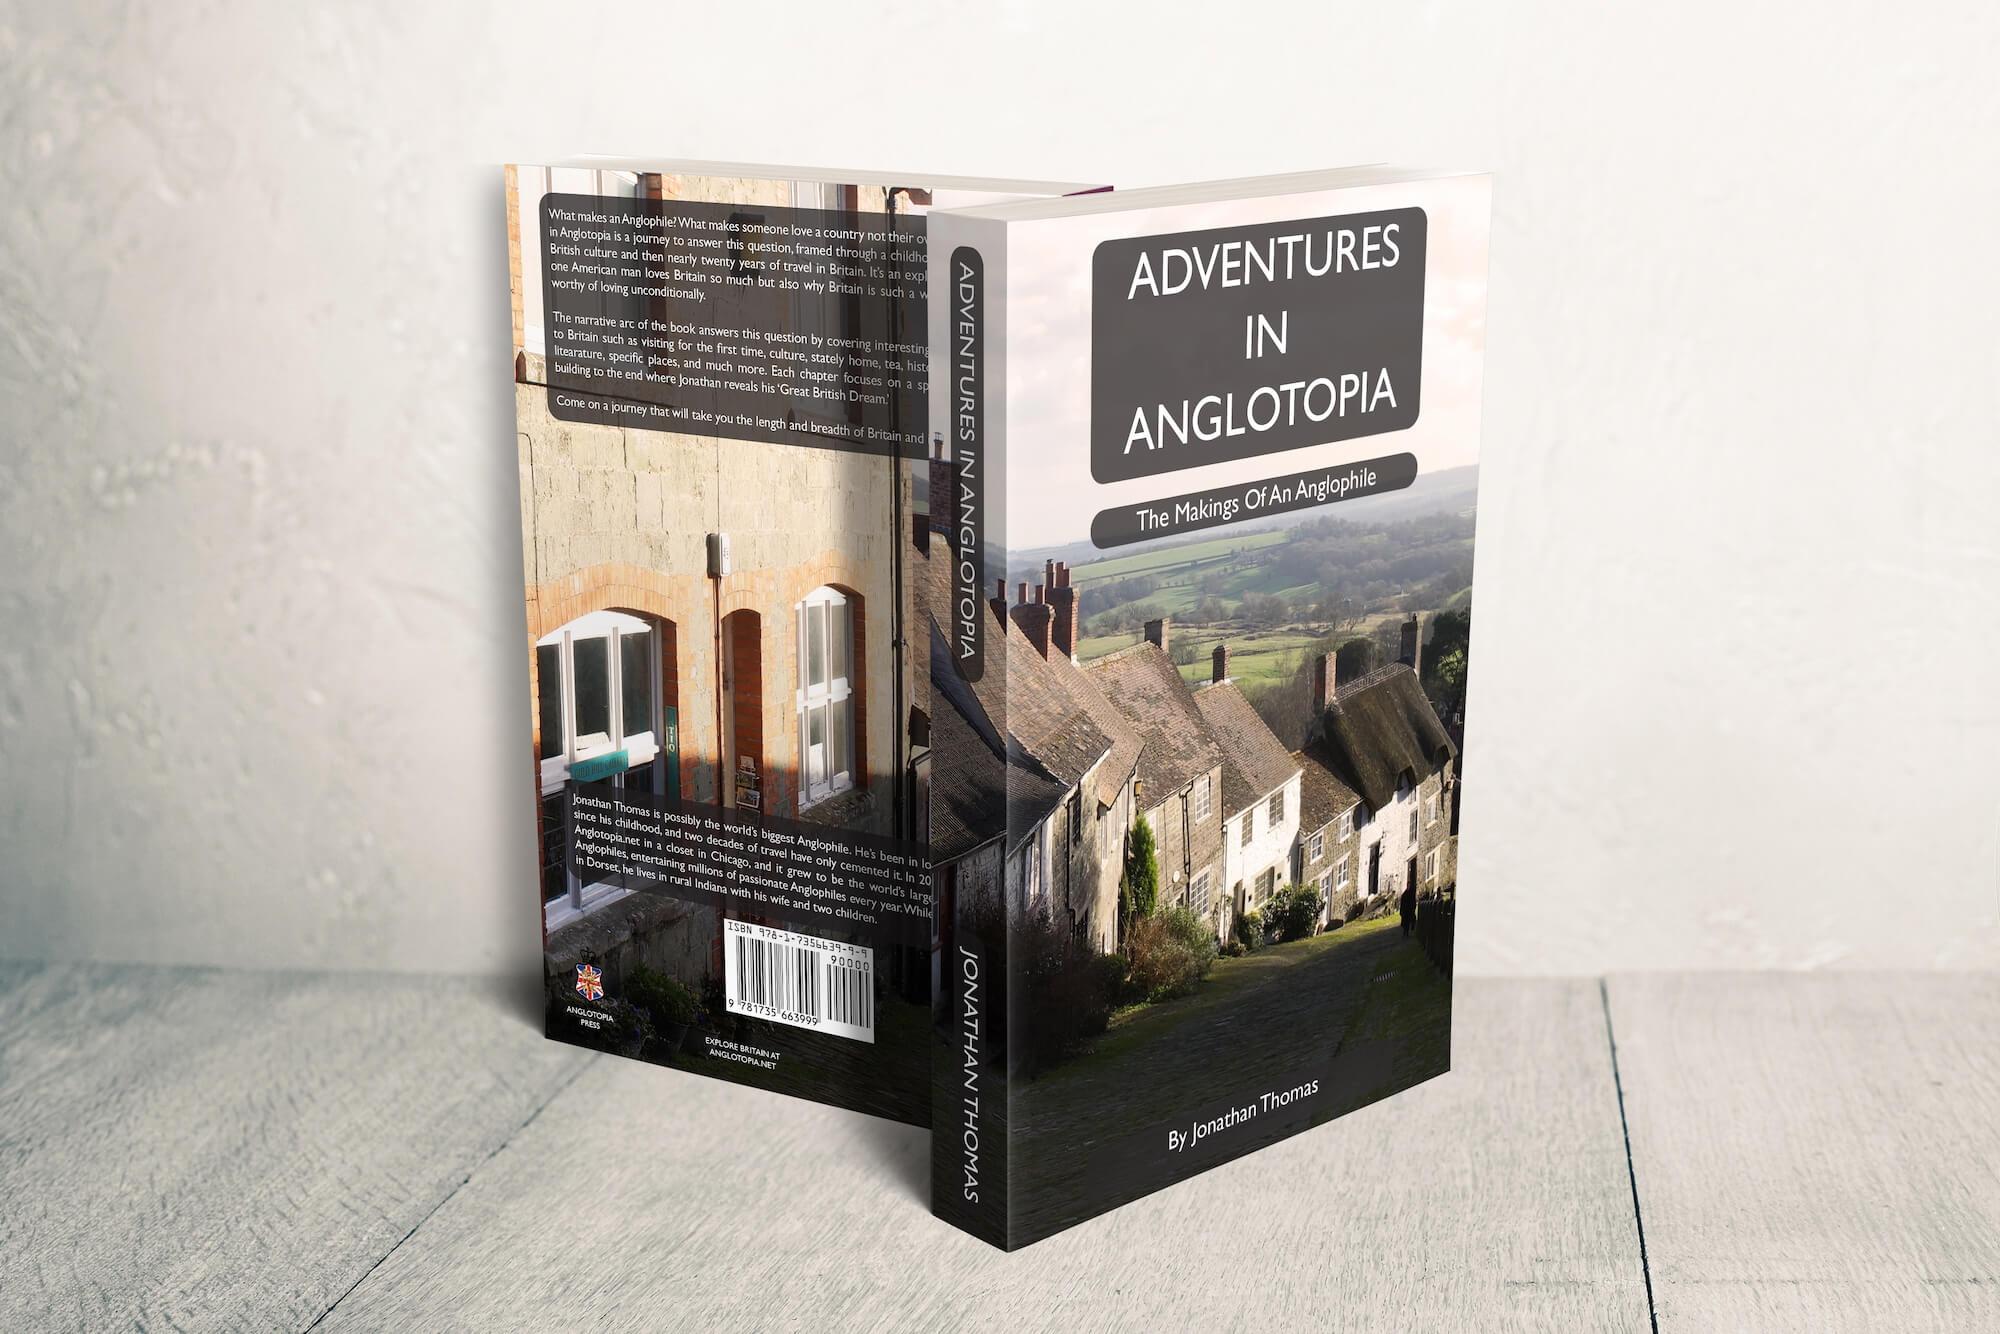 adventures-in-anglotopia-paperback-mockup-background-half-res-compressed.jpg